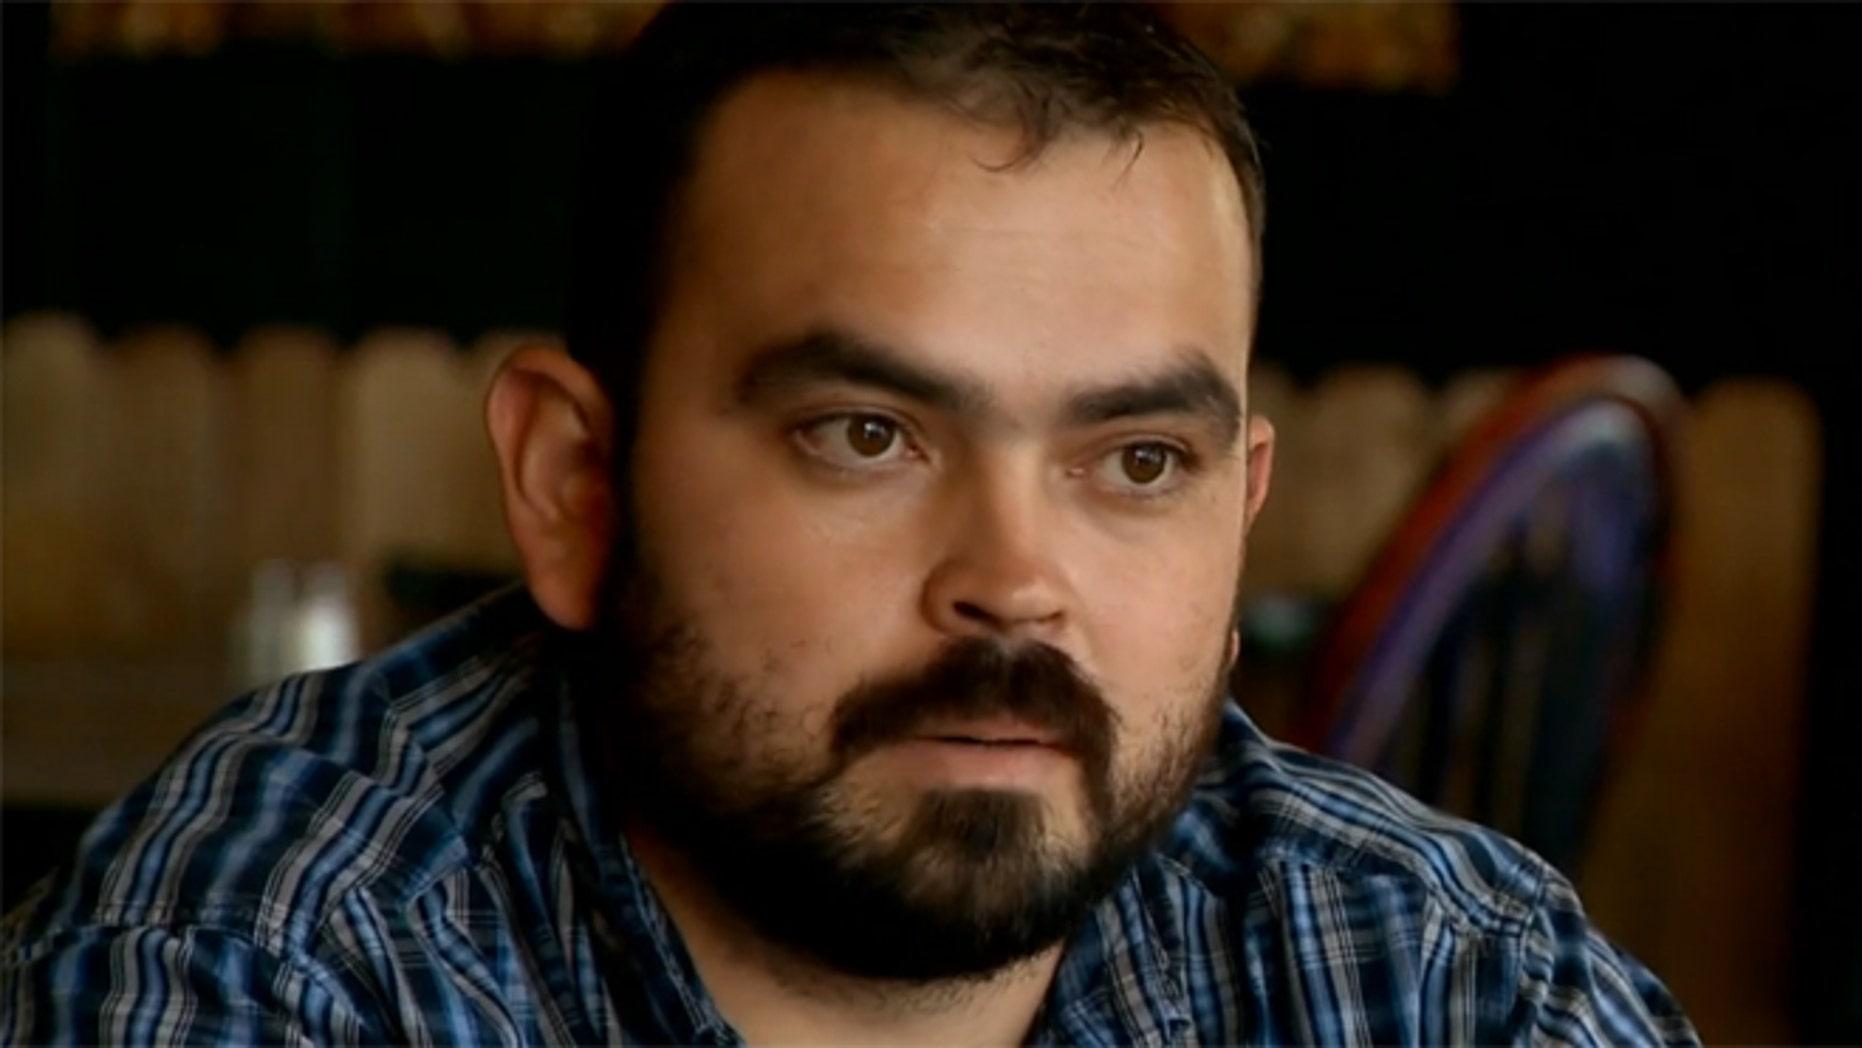 Edgar Antillon (Photo: Screen grab from KUSA-TV)